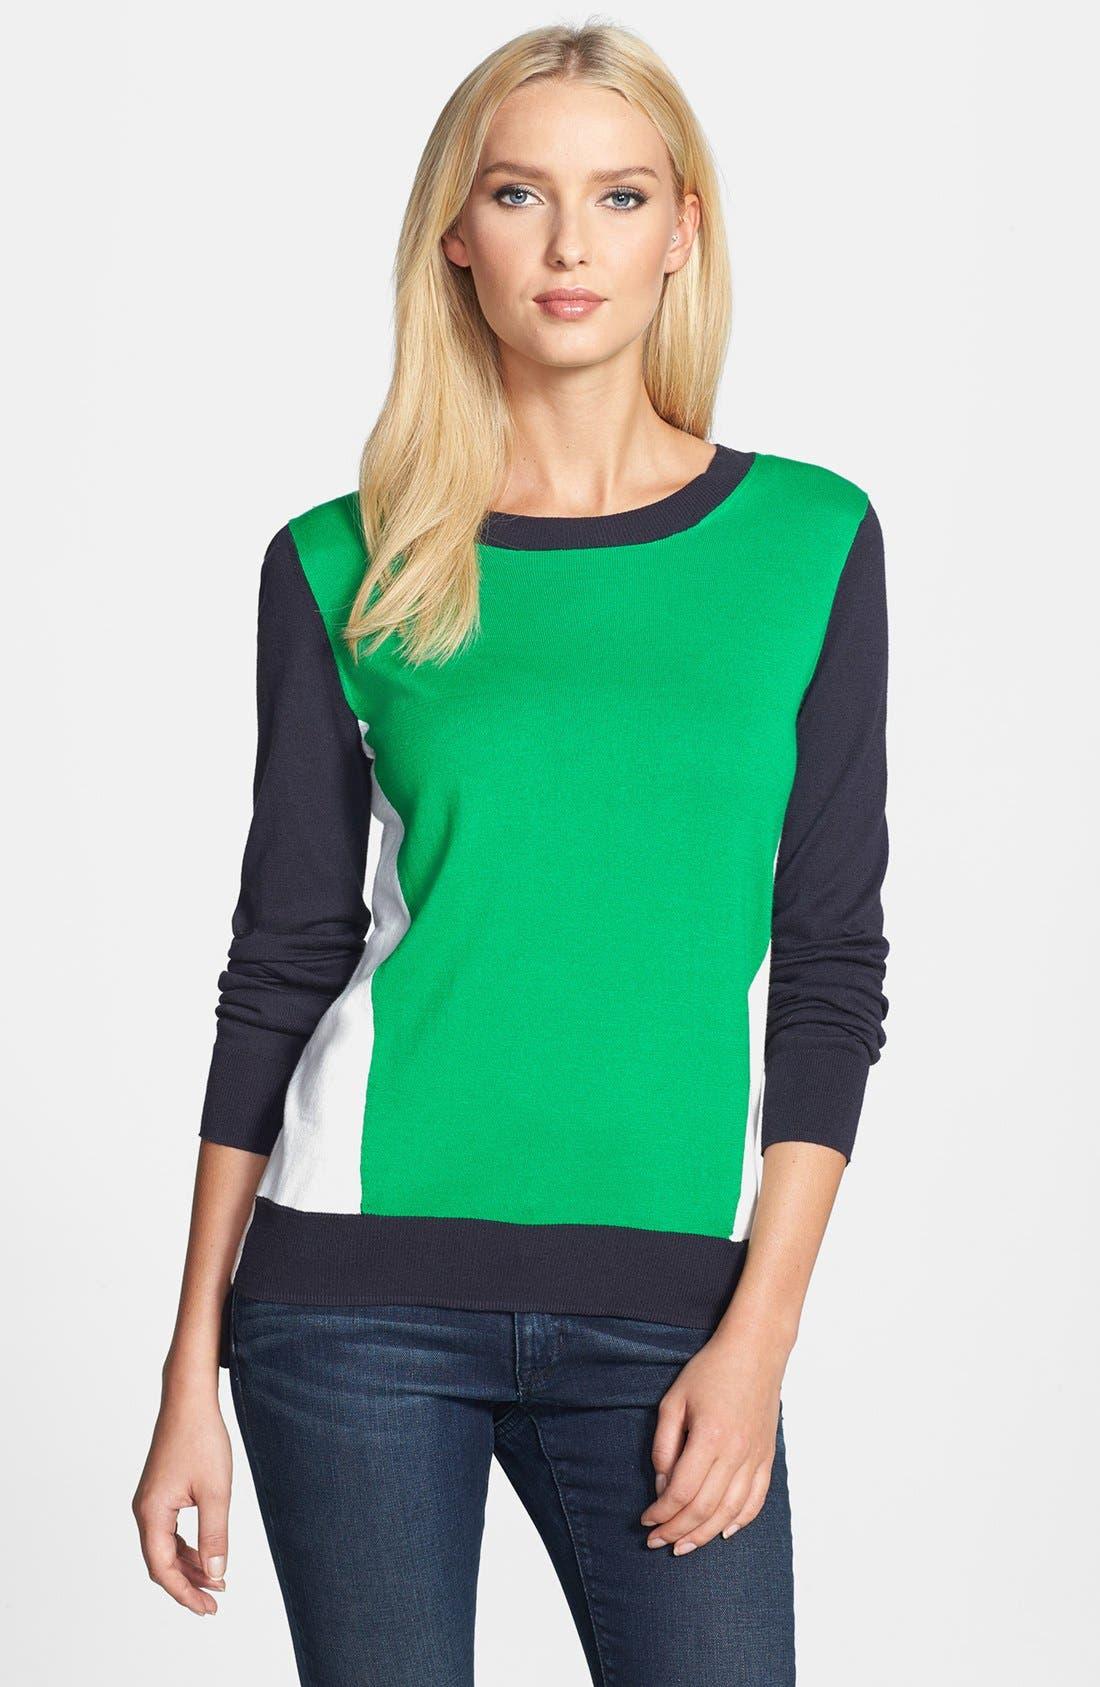 Alternate Image 1 Selected - MICHAEL Michael Kors Colorblock Cotton Blend Crewneck Sweater